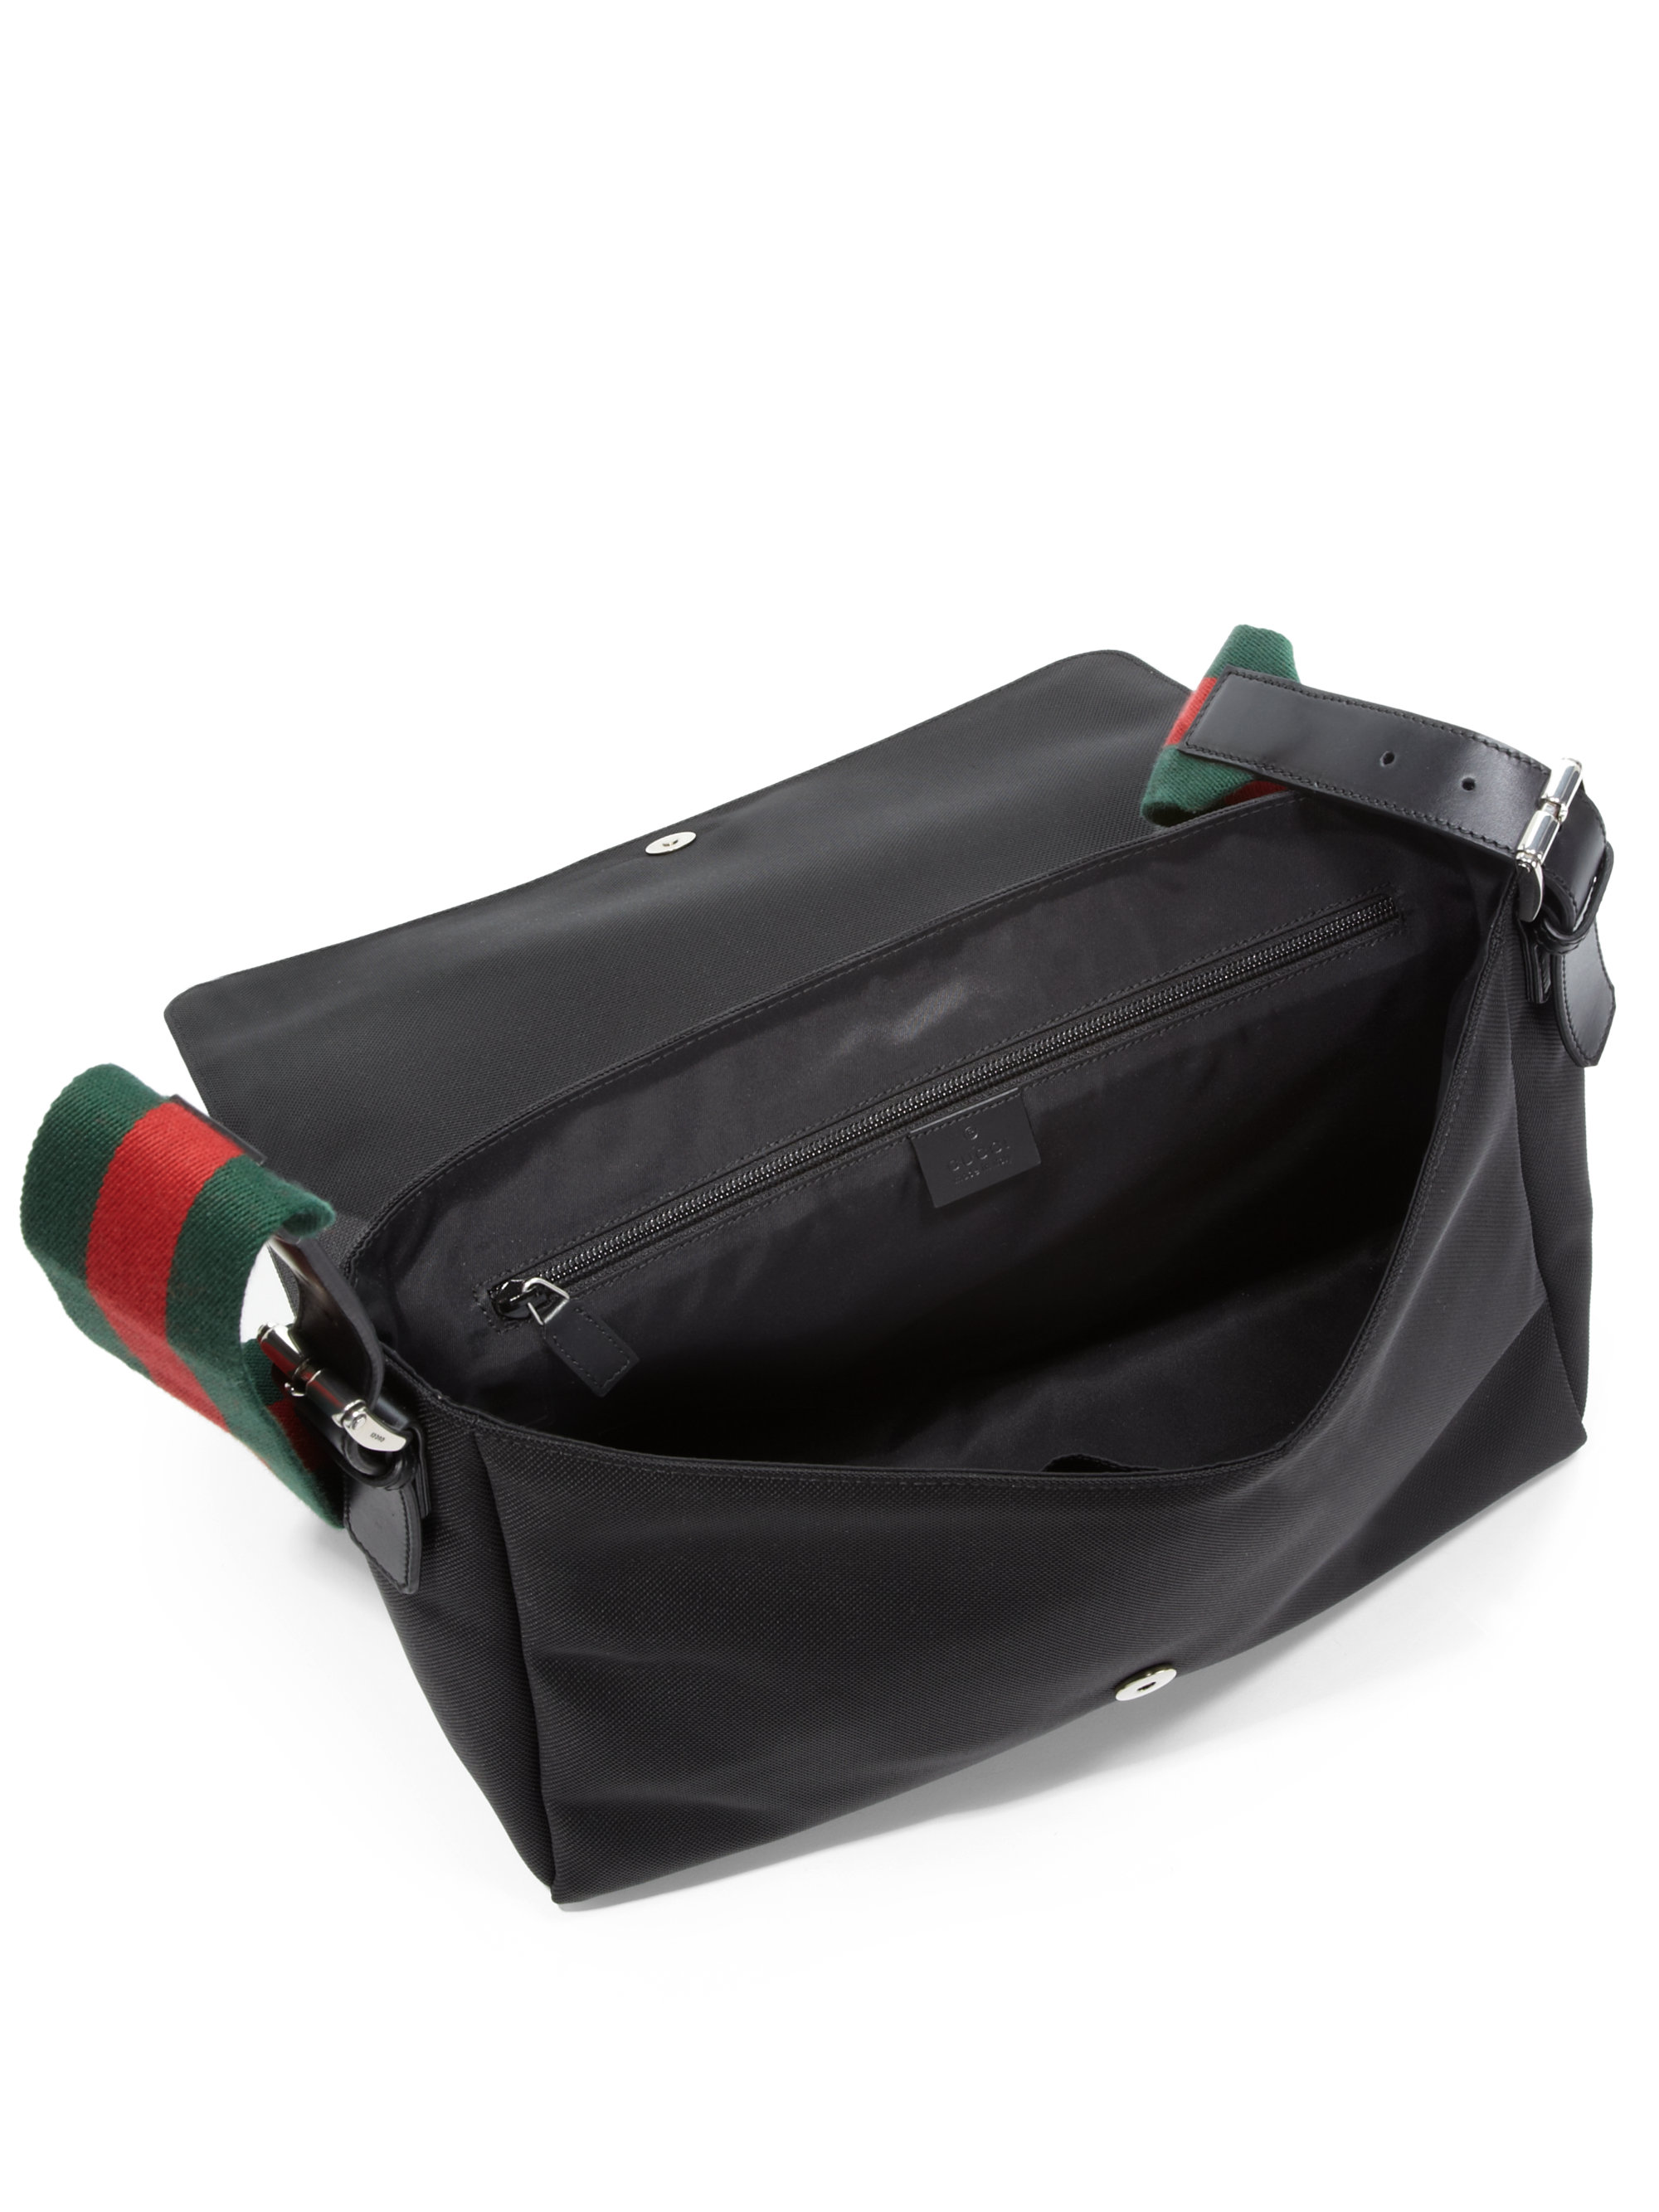 Gucci Techno Canvas Messenger Bag in Black for Men - Lyst